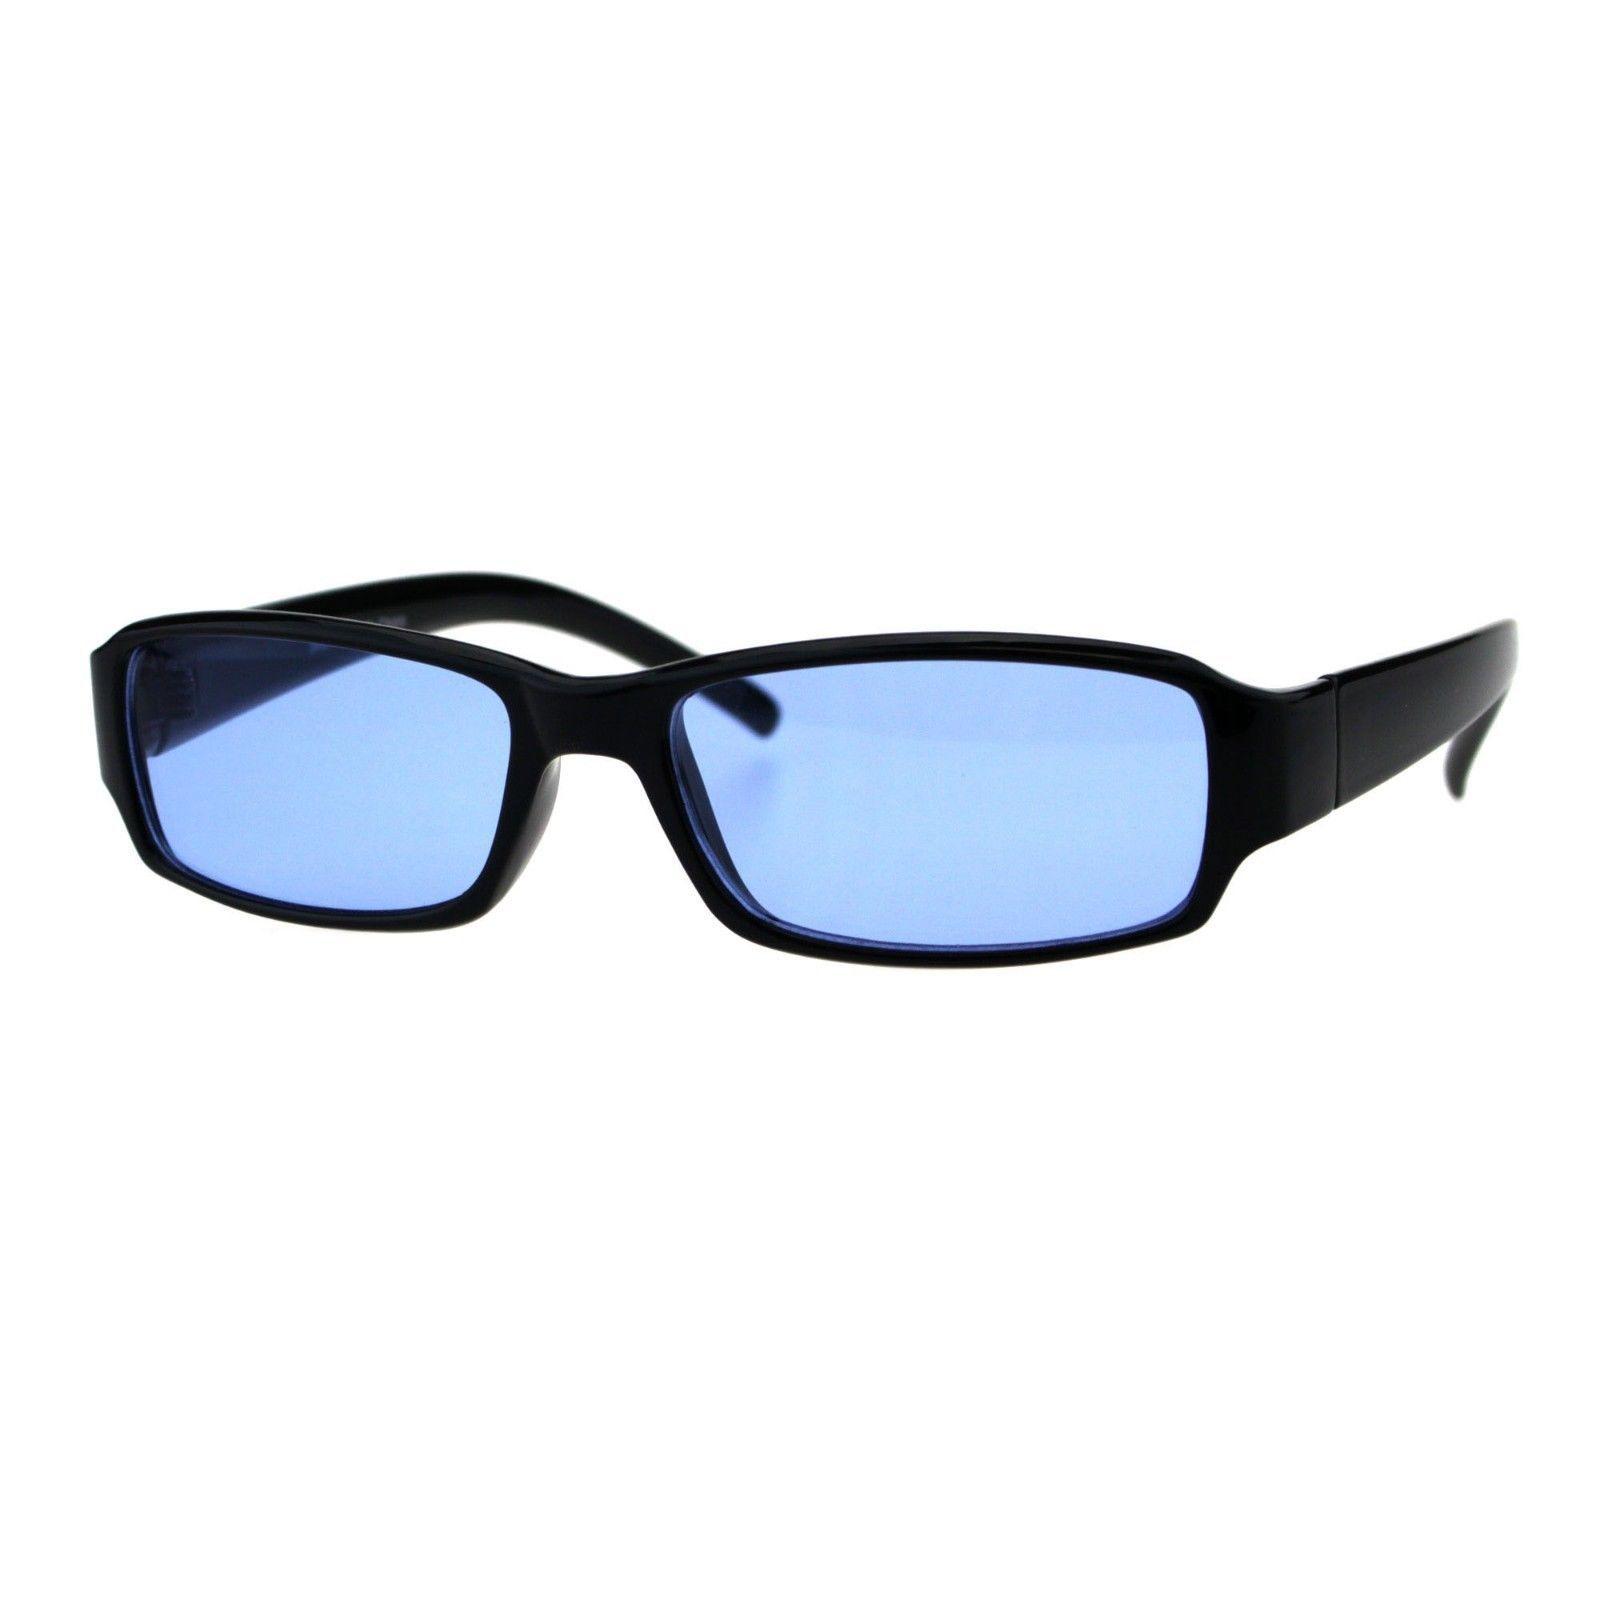 Black Rectangular Frame Sunglasses Simple Classic Shades Color Lens UV 400